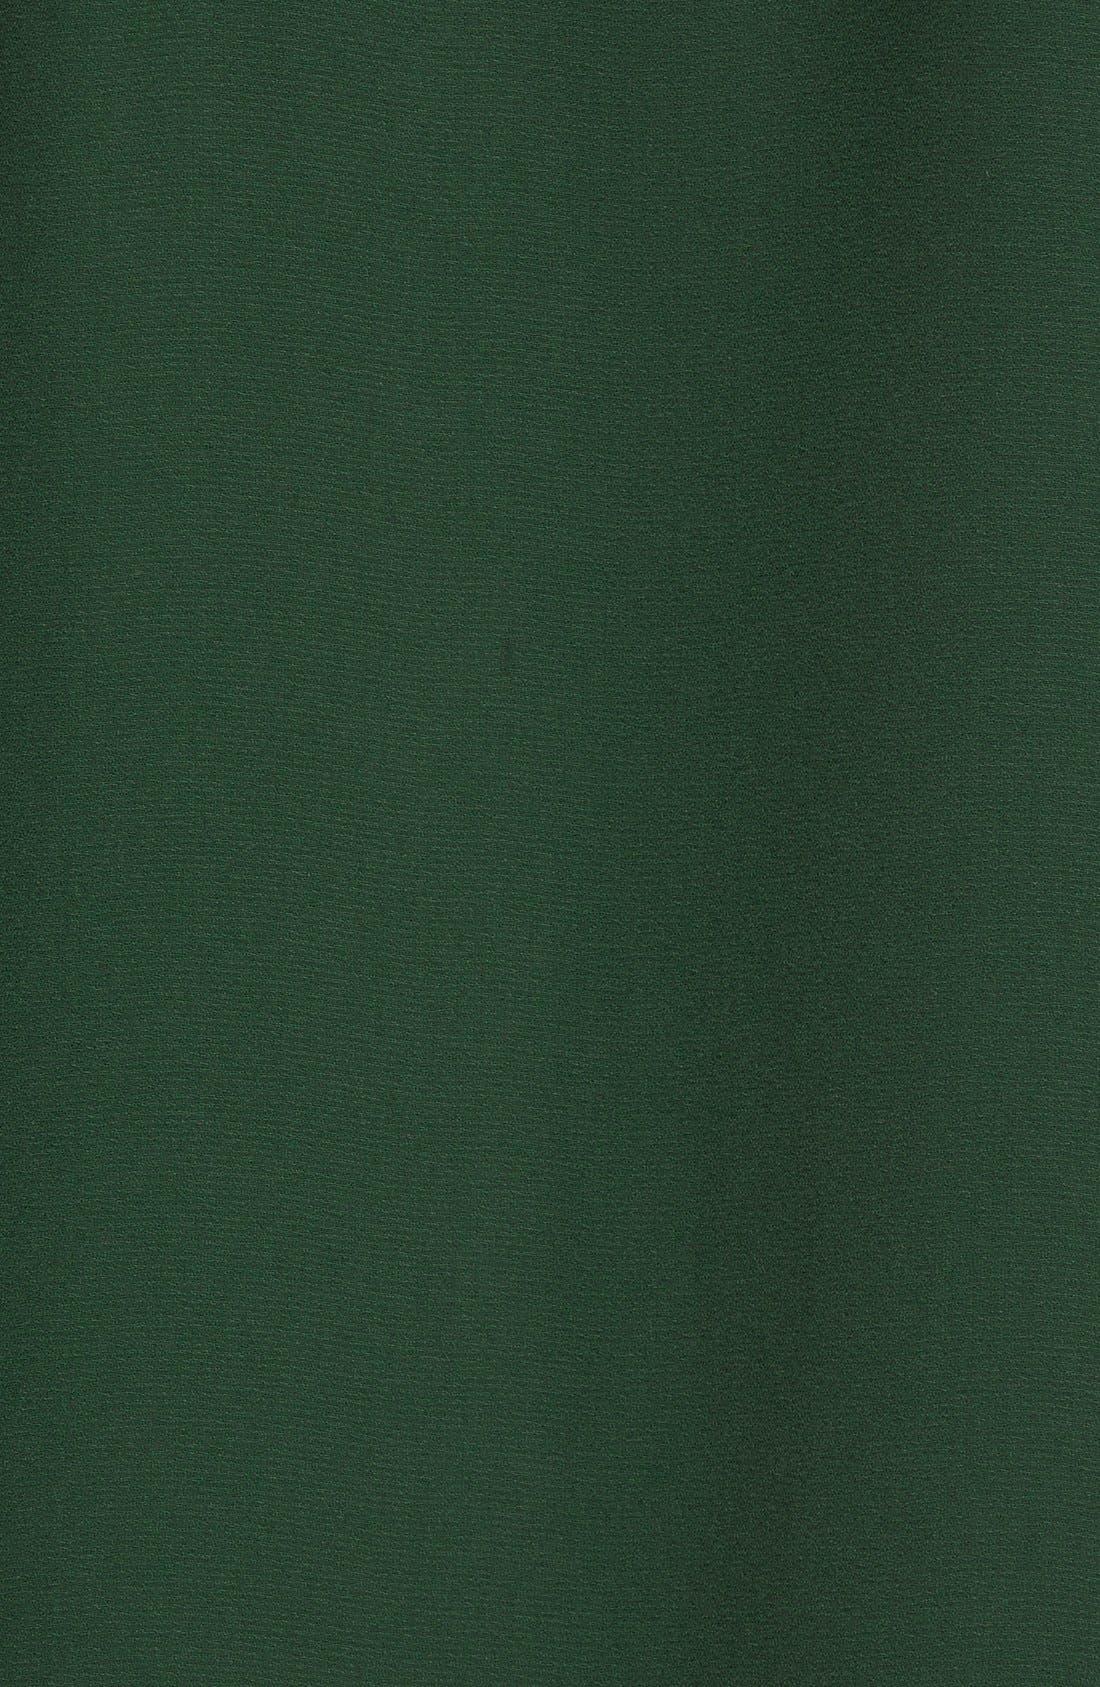 Alternate Image 3  - Bailey 44 Long Sleeve Tie Neck Blouse (Nordstrom Exclusive)